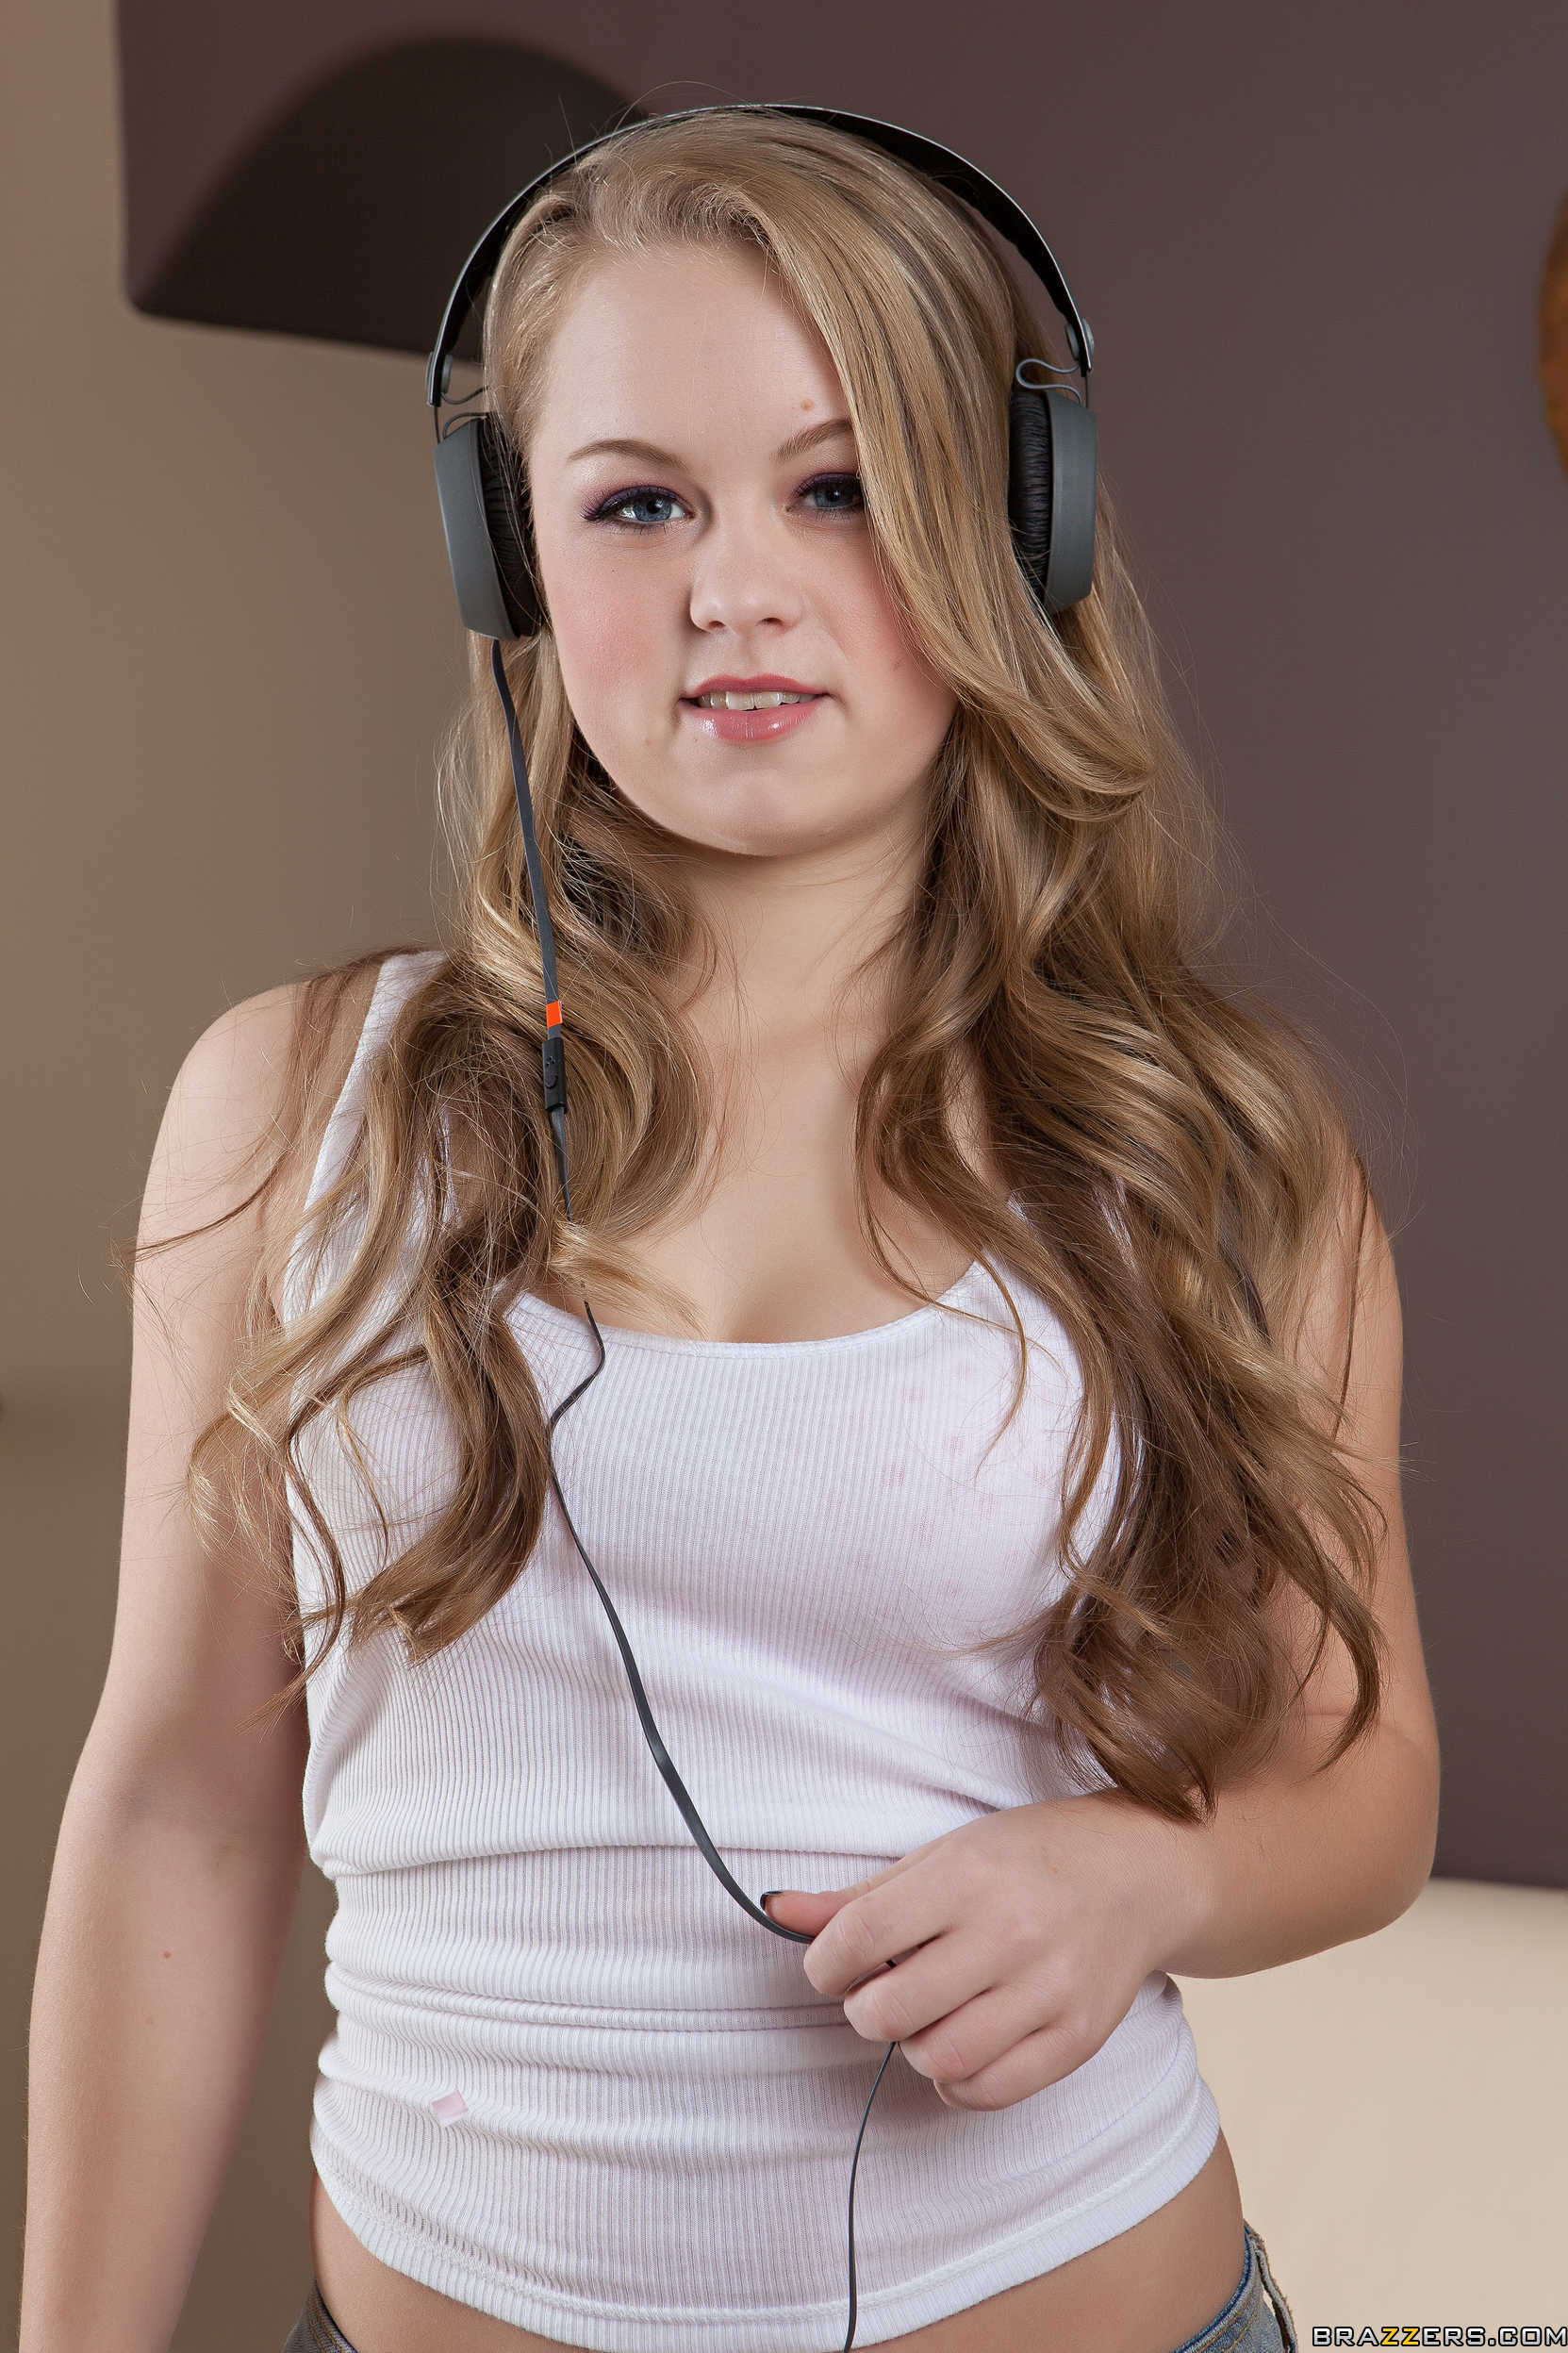 Madison Chandler - la jovencita muestra su rica conchita